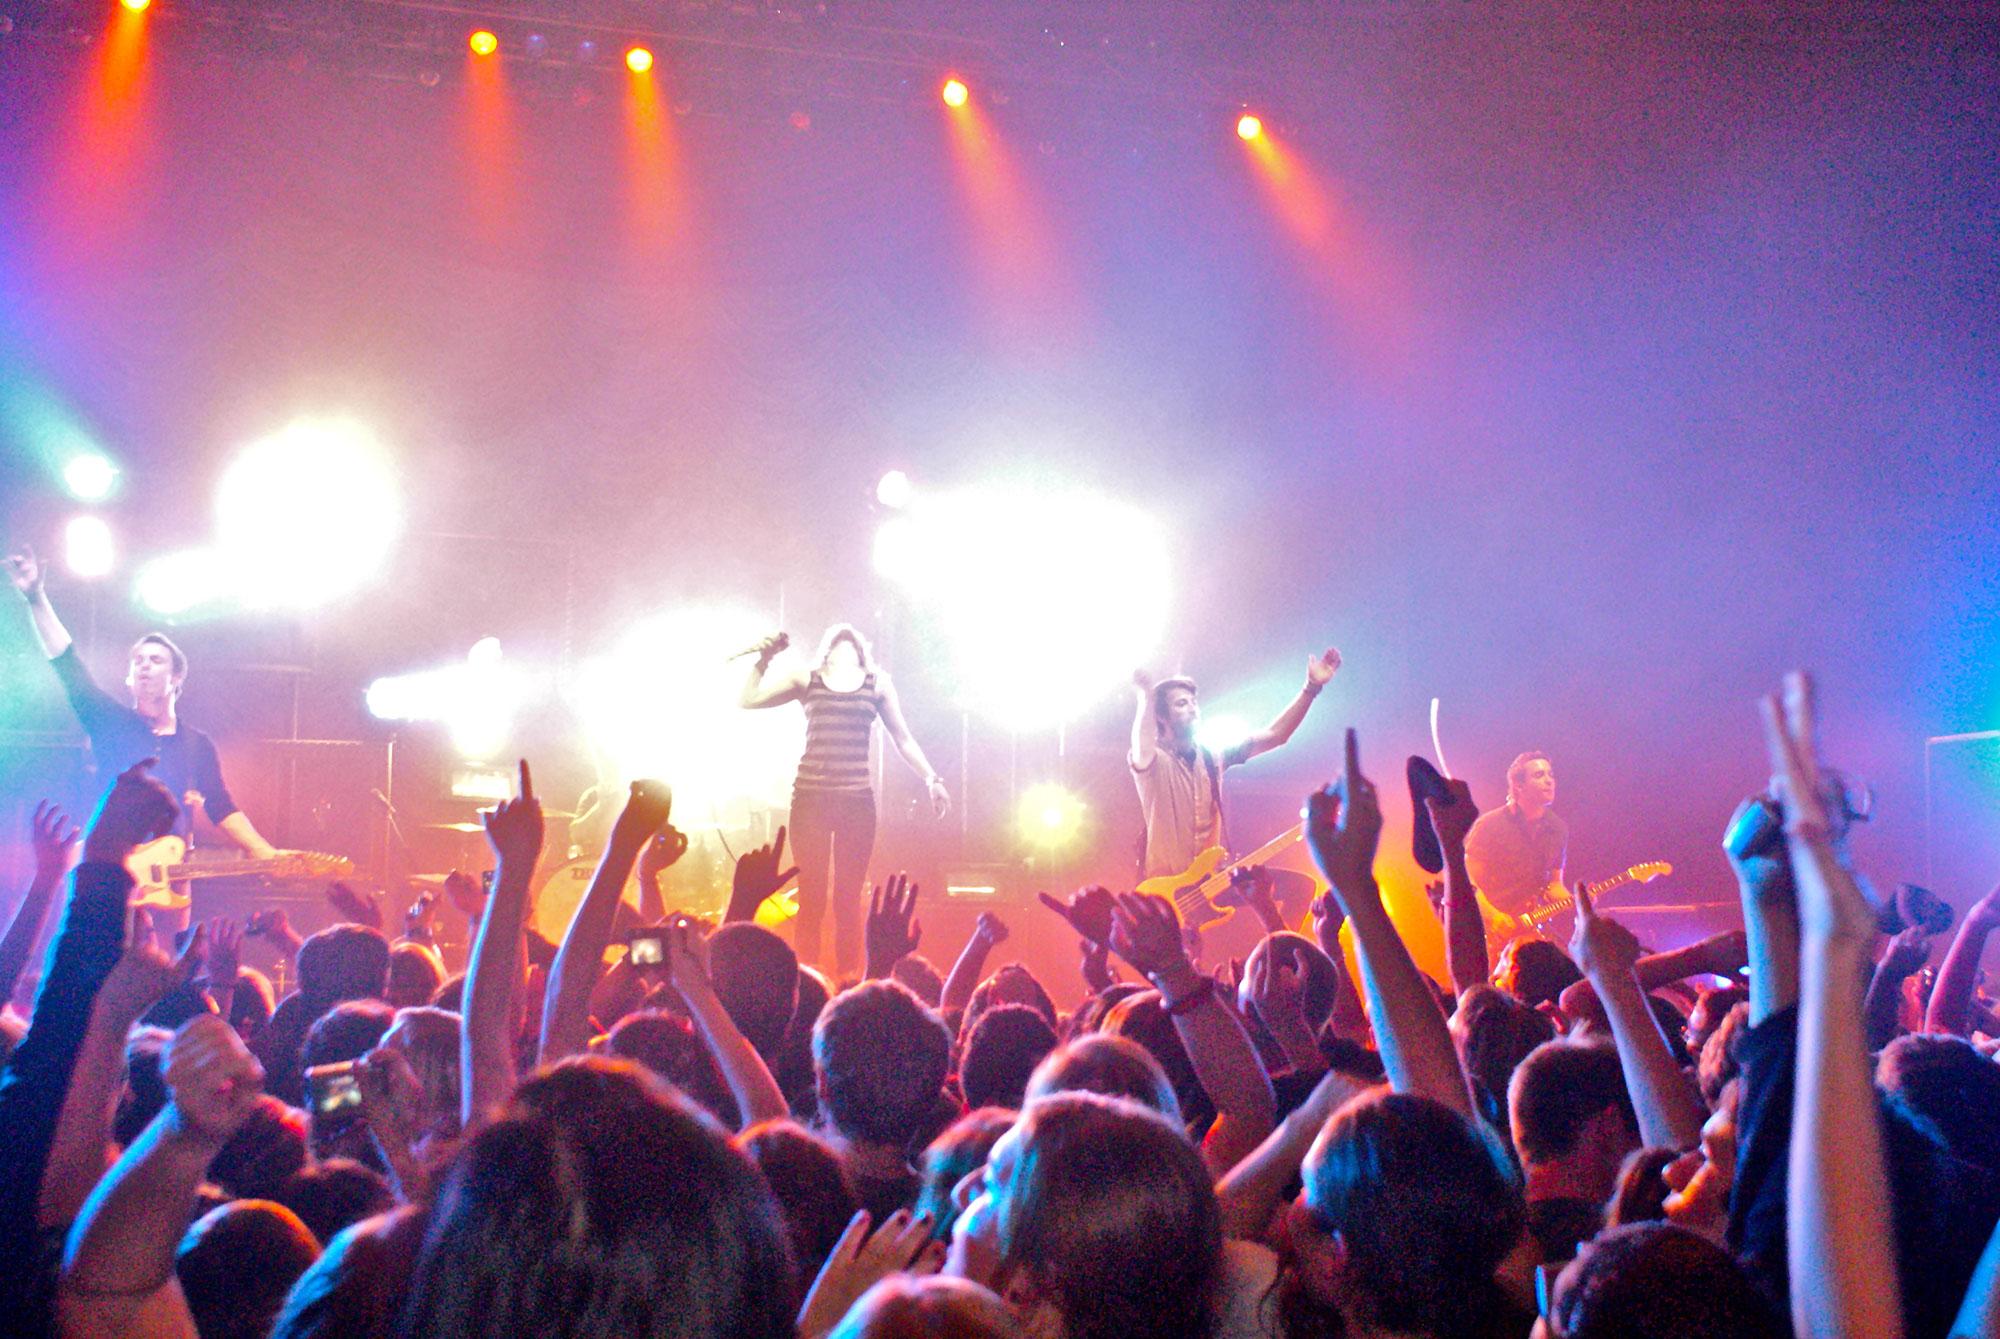 Musik konsert